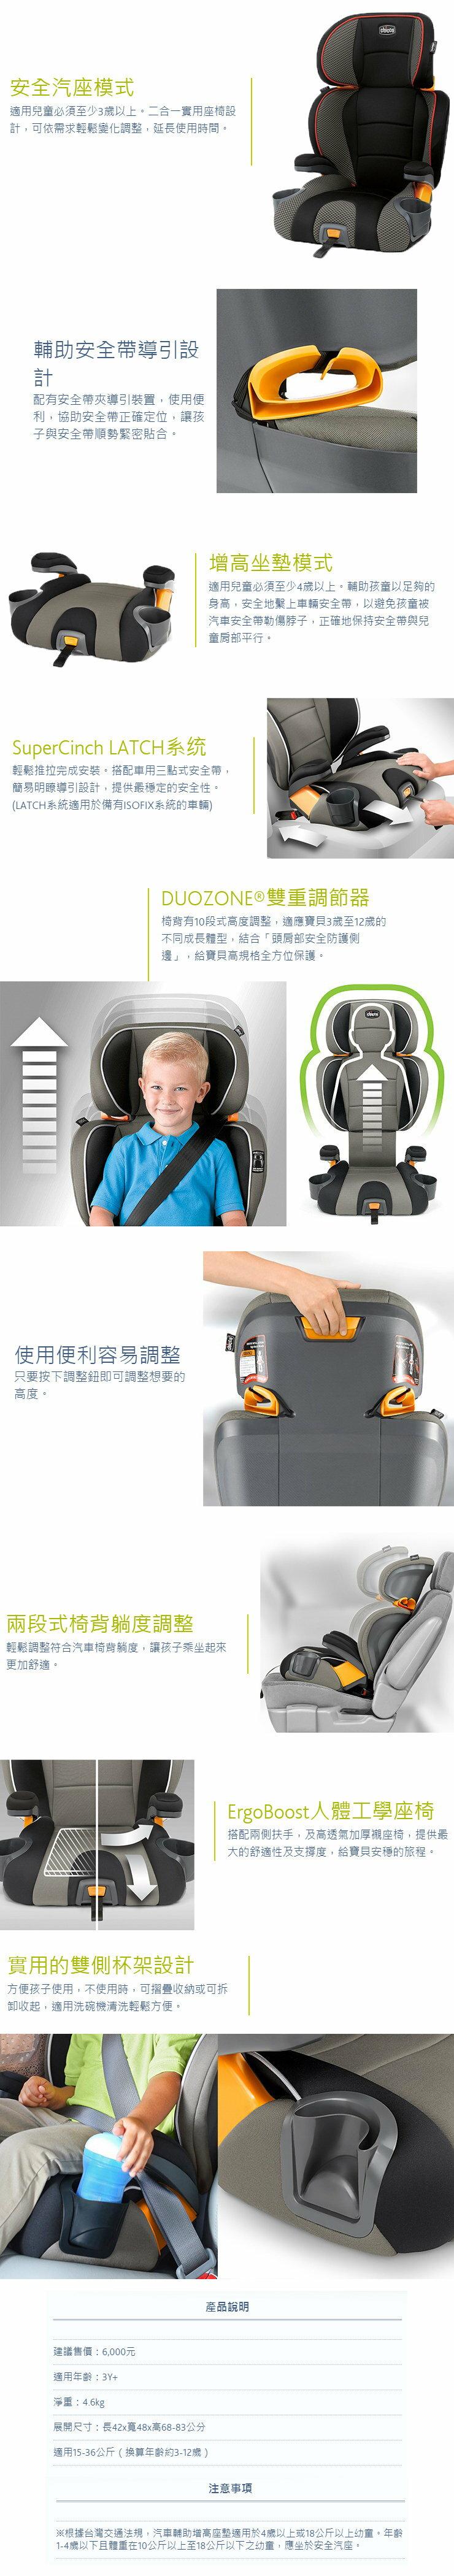 Chicco KidFit成長型安全汽座(風格黑) 4280元 3